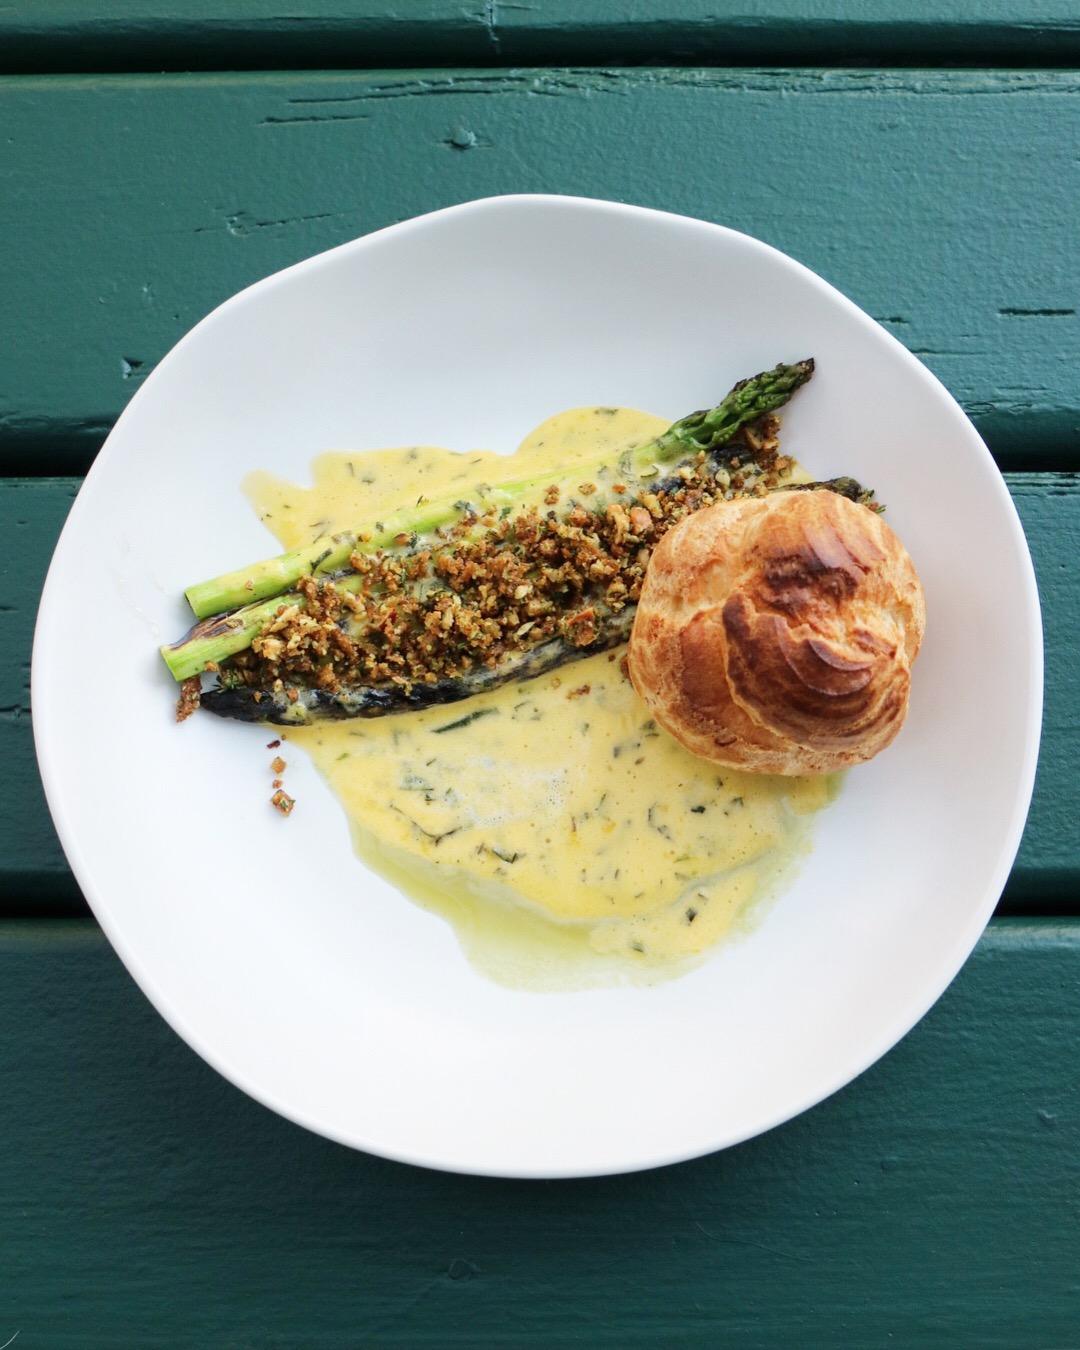 Grilled Asparagus, Hazelnut Crumble, Gougere, Asparagus Jus, Bearnaise